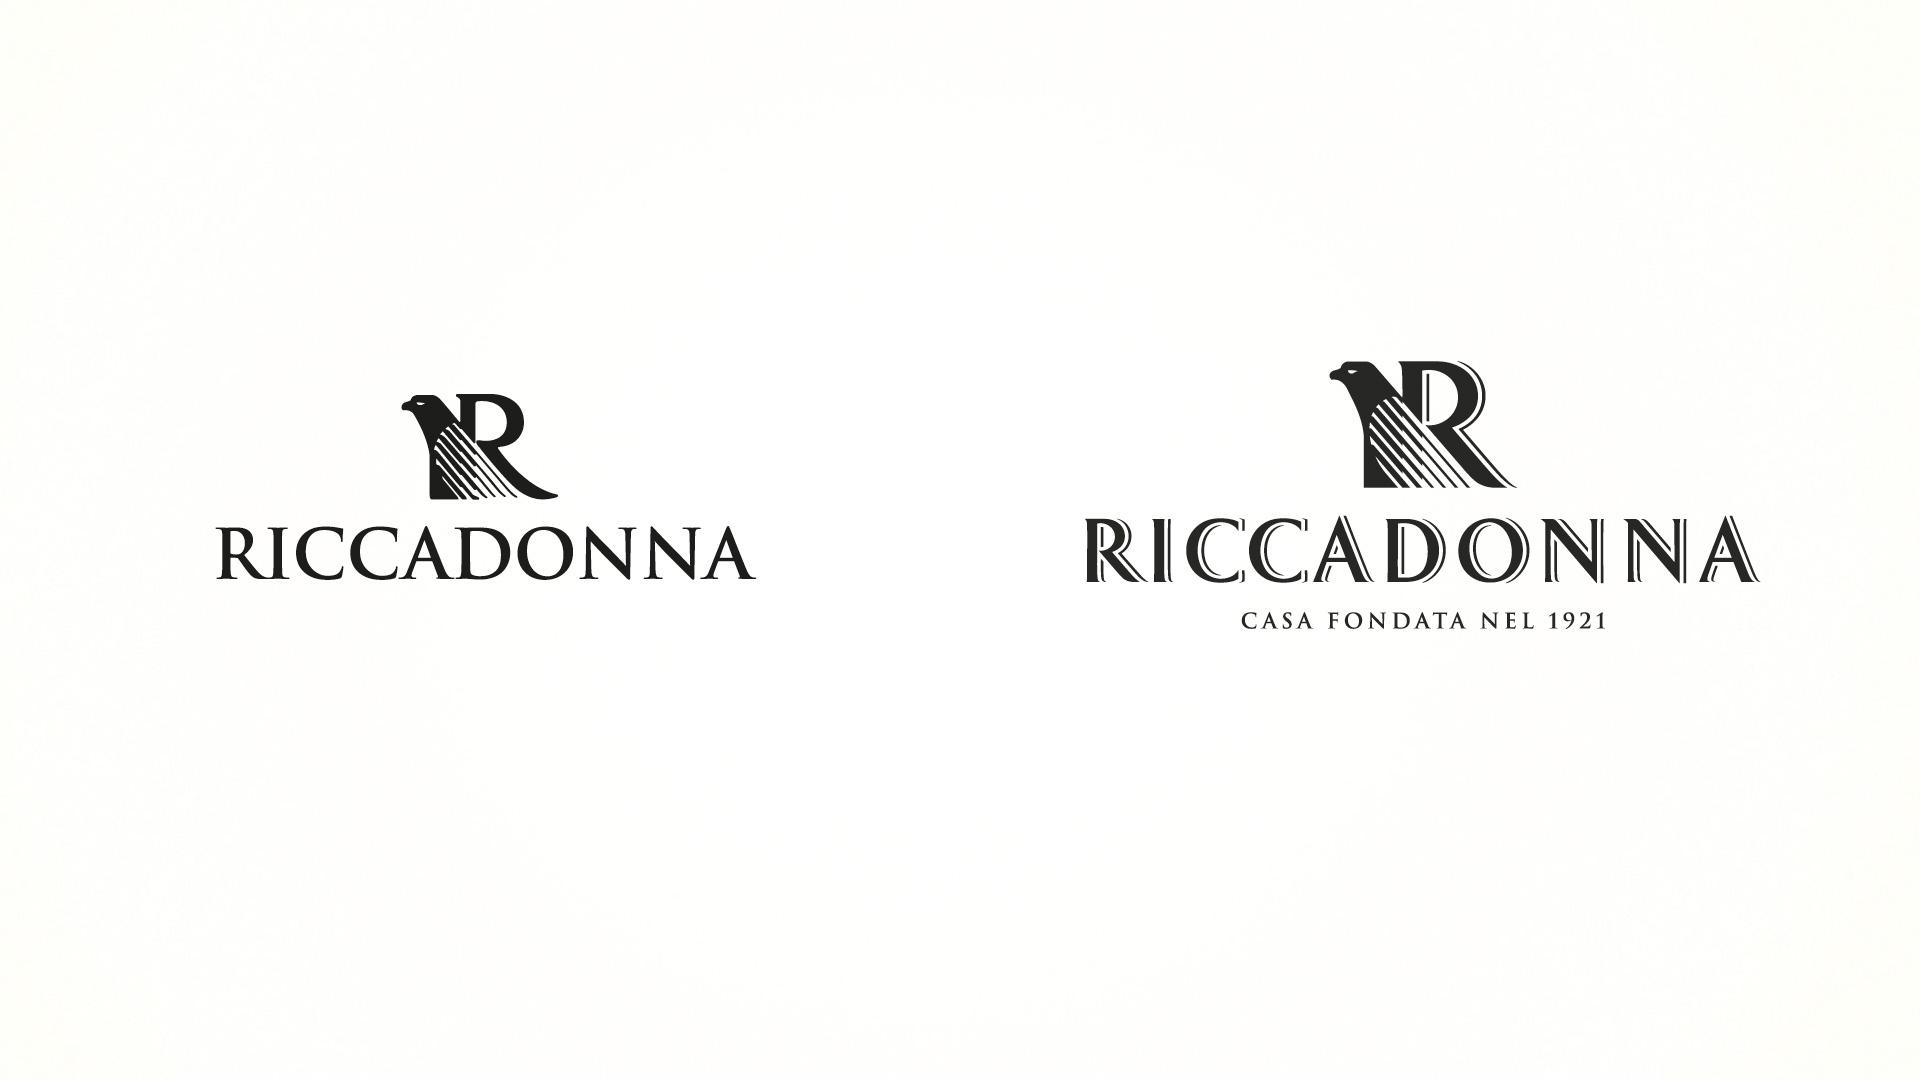 Riccadonna restyling brand